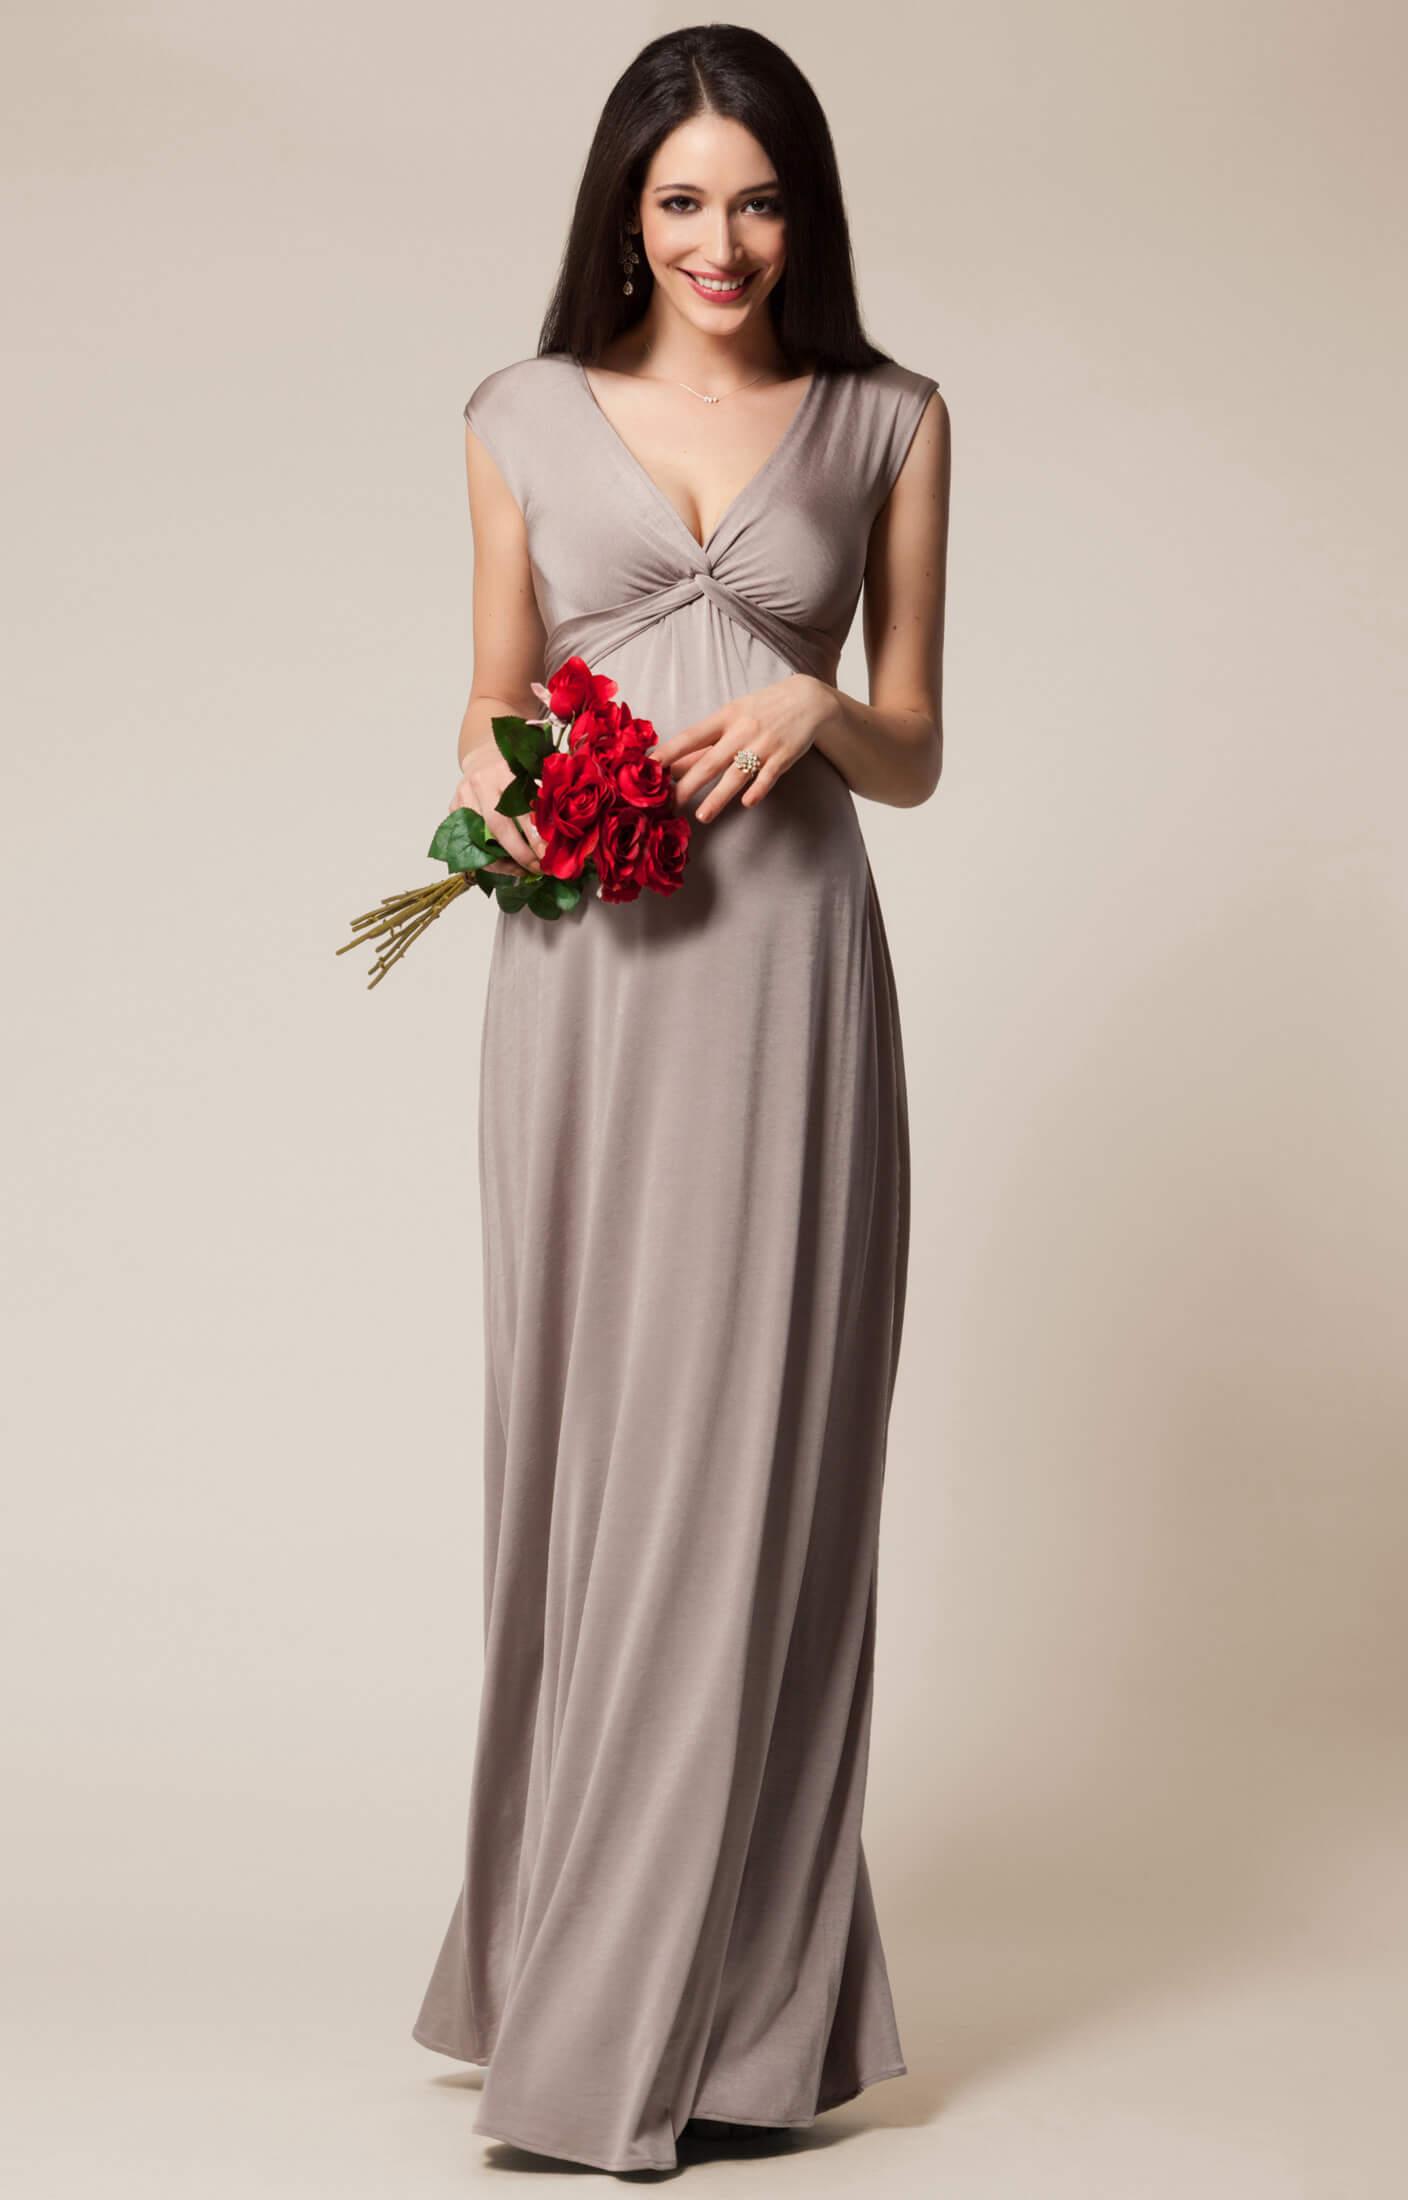 Clara maternity gown long mocha maternity wedding dresses clara maternity gown long mocha by tiffany rose ombrellifo Images